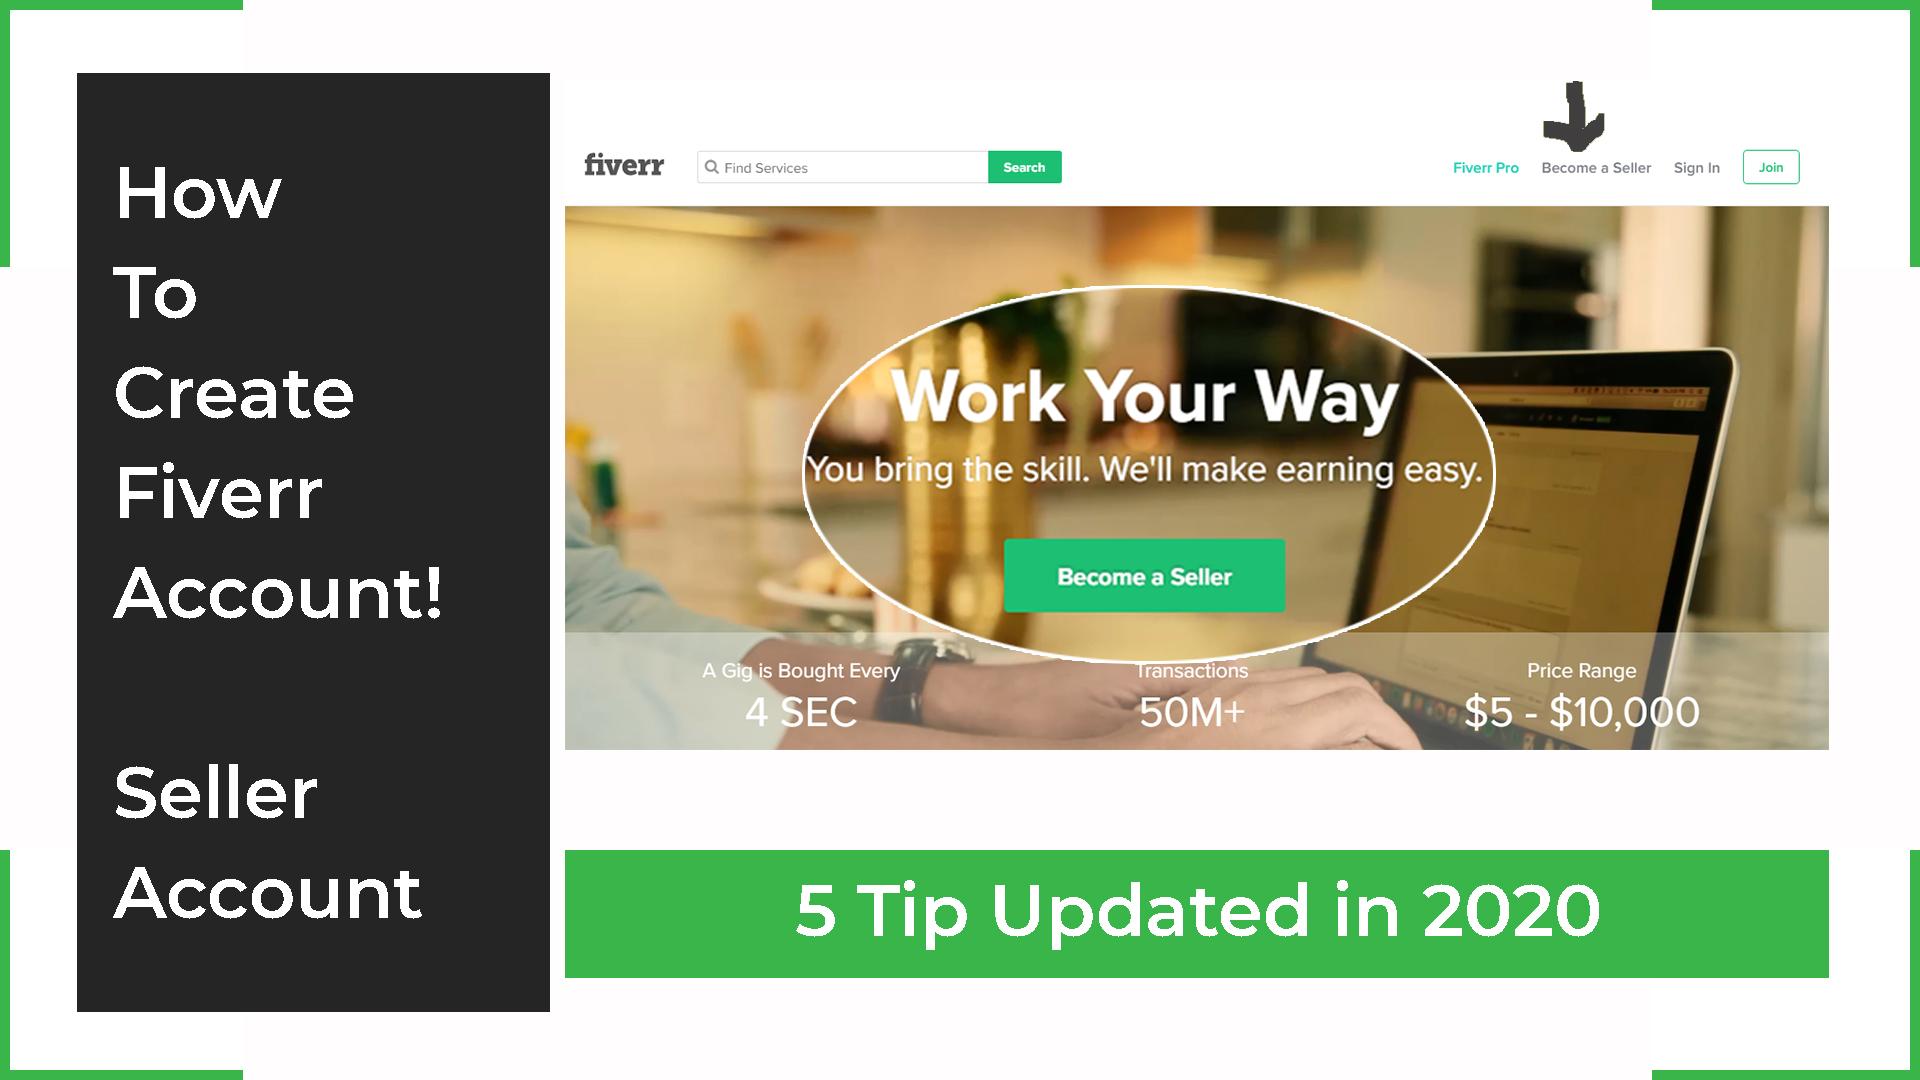 How To Create Fiverr Account, Greensoft dhaka